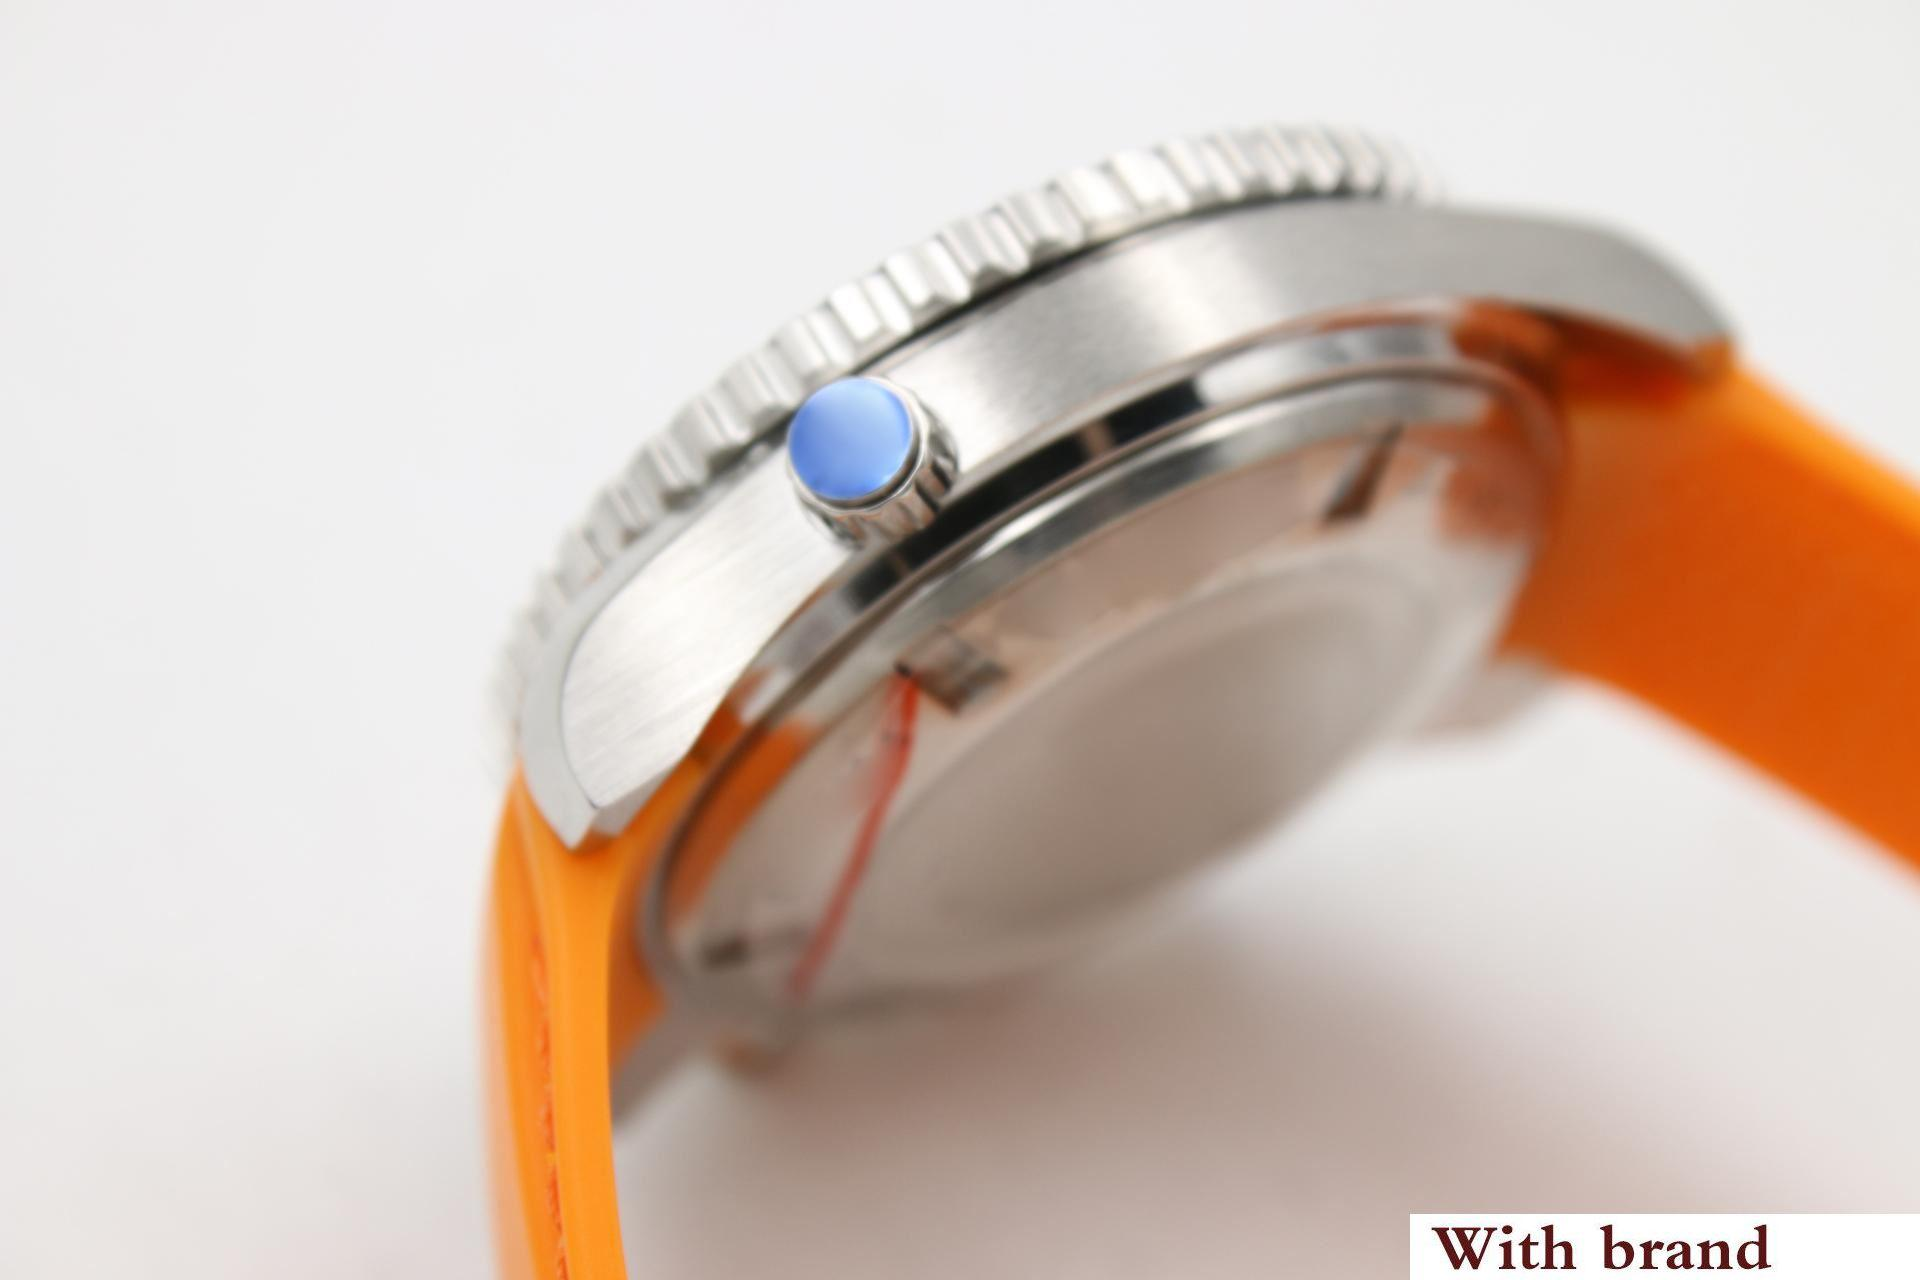 luxury men's quartz movement hippocampus series 23232422101001 orange rubber strap oneway rotating bezel master watch